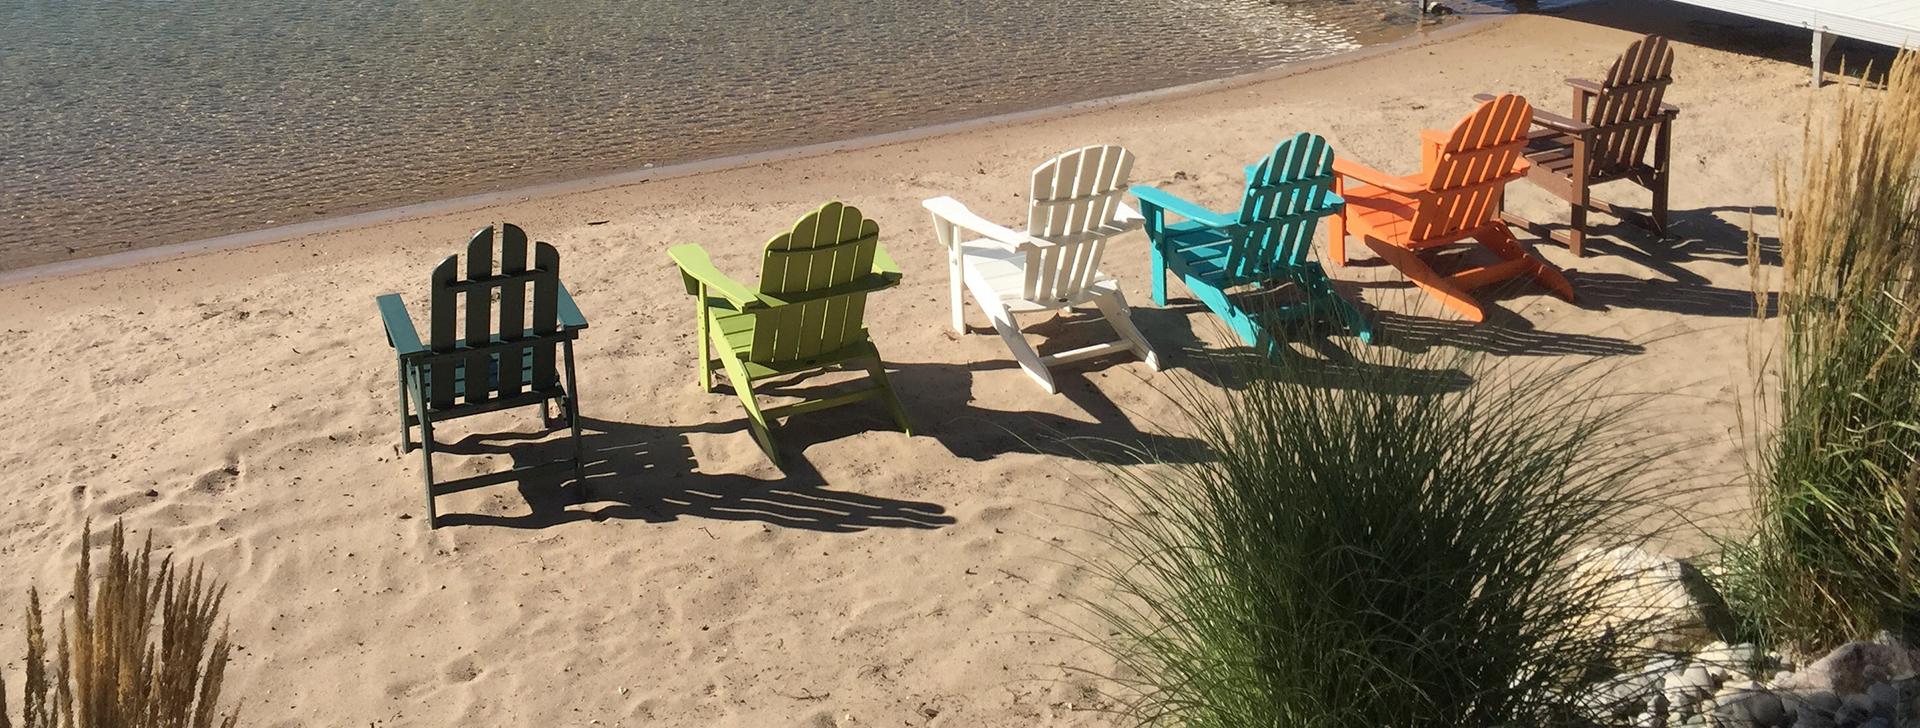 Adirondacks on a Beach